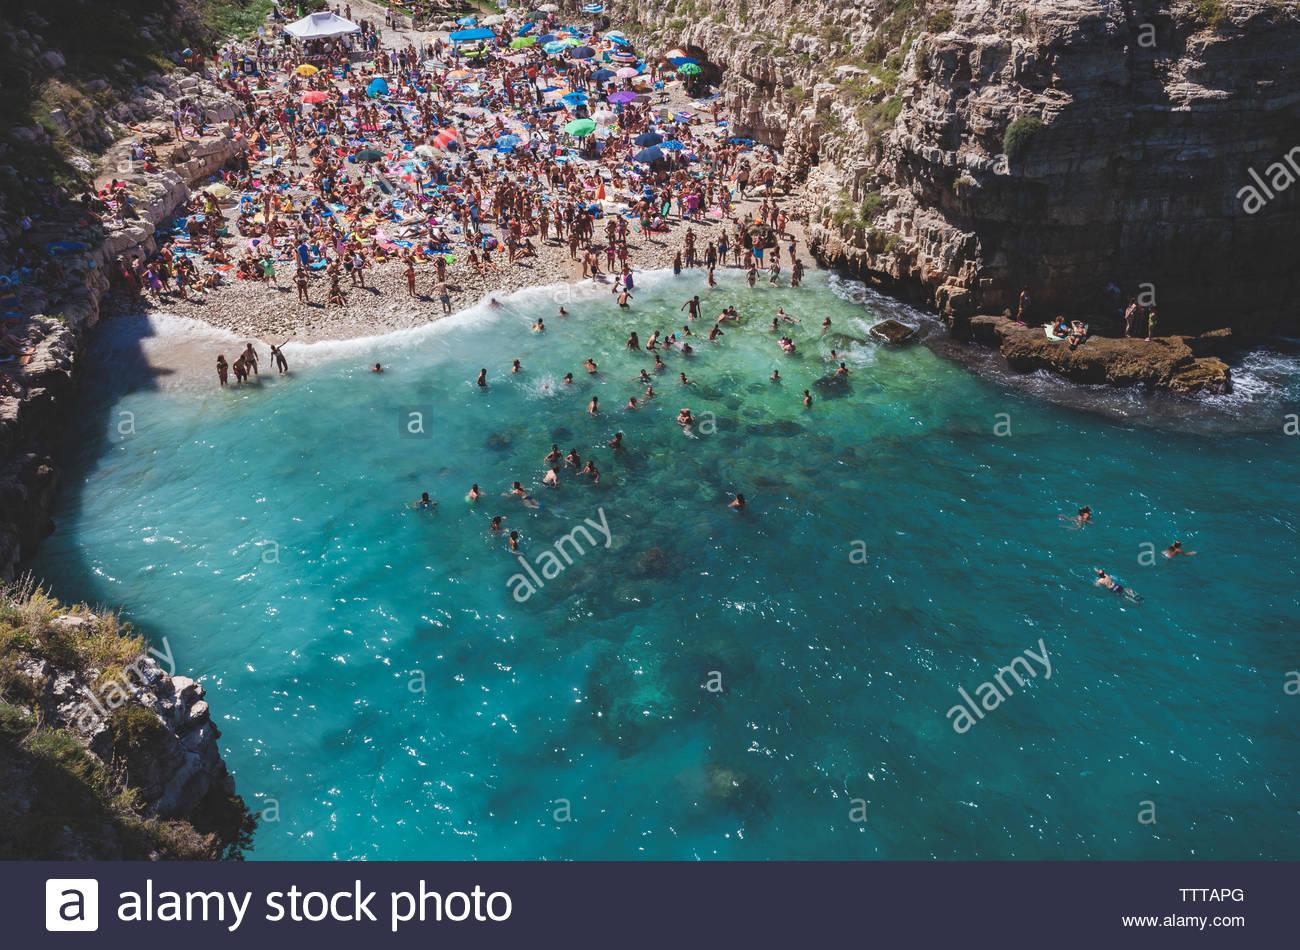 Polignano a Mare - Bari province - Apulia - Italy - south italy sea village lagoon. - Stock Image